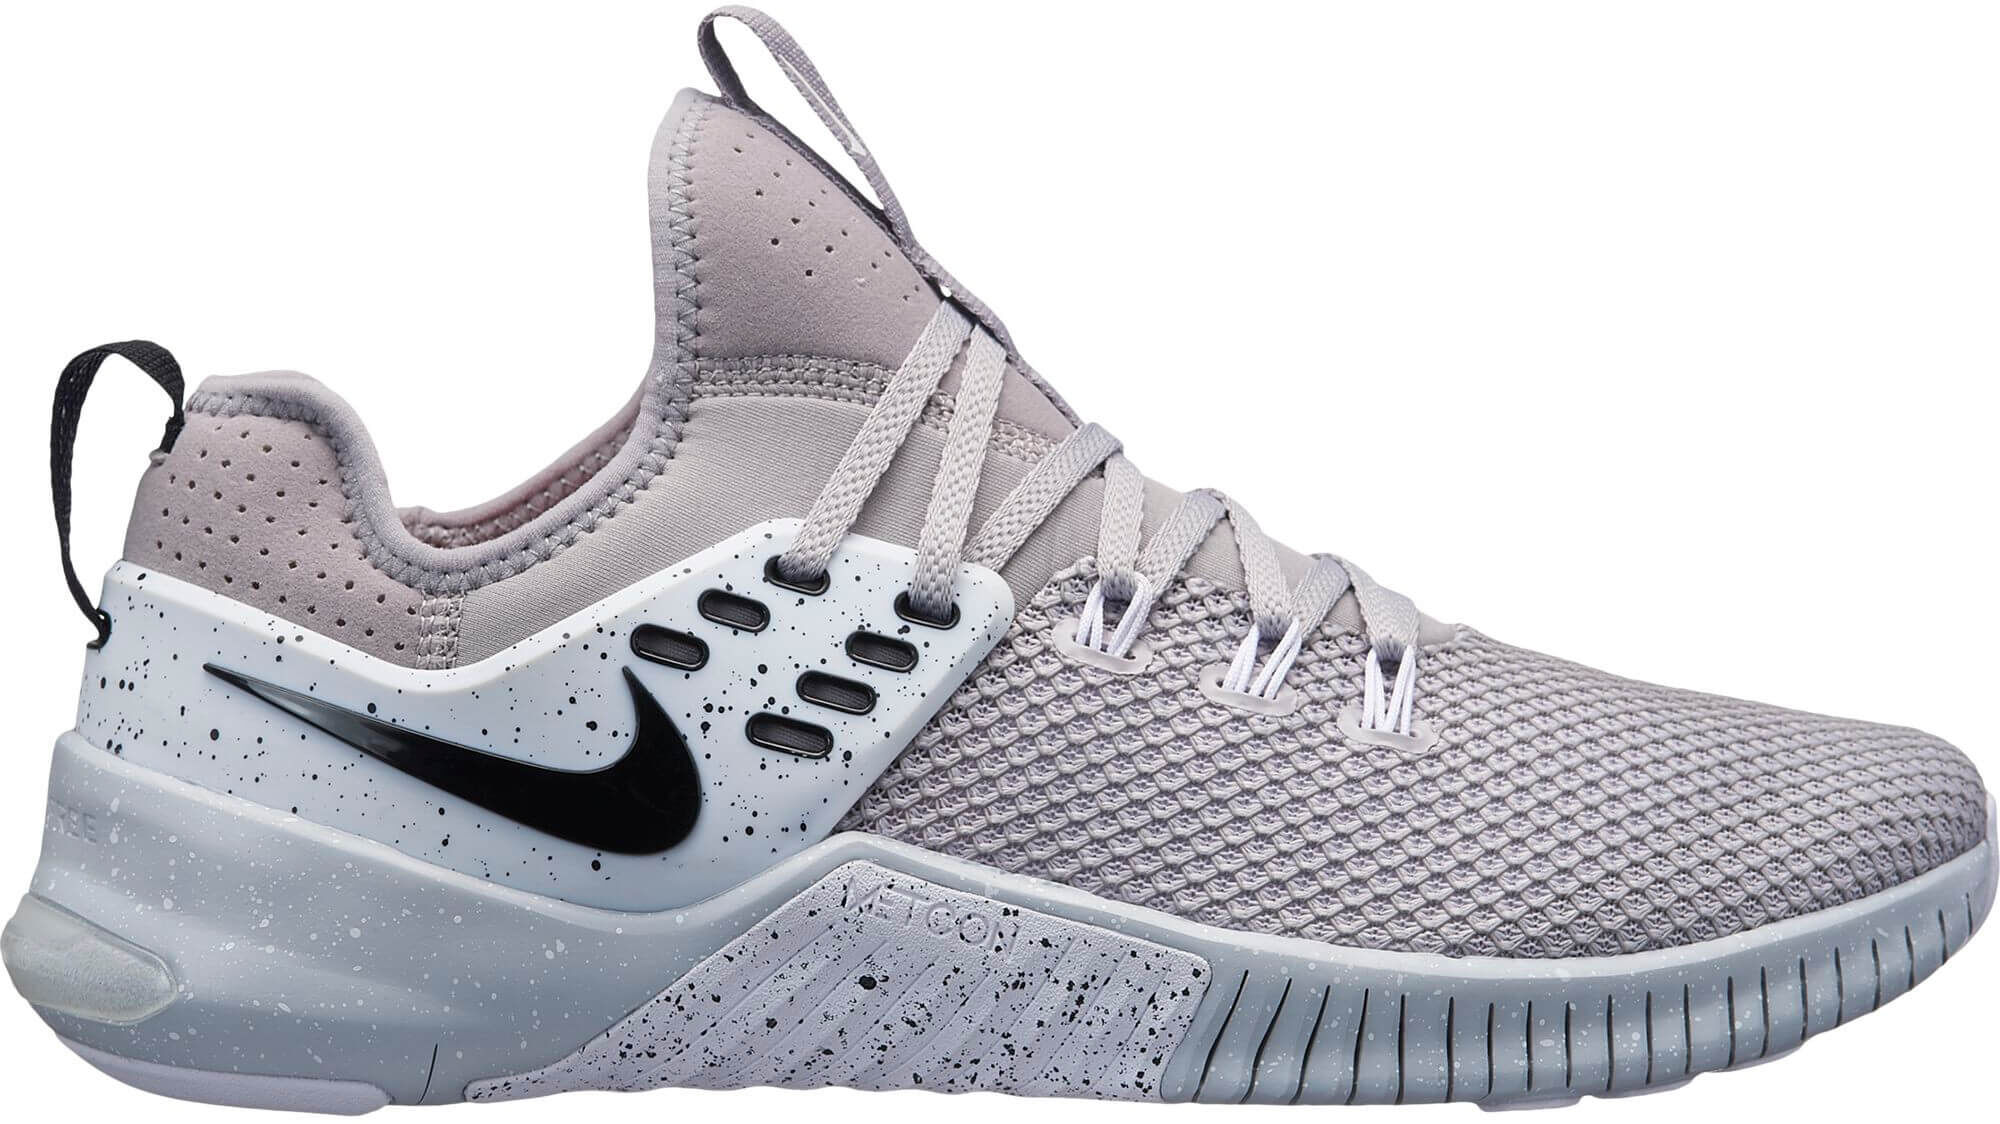 Stort Udvalg Nike Free 4.0 Billige Priser | Nike Free 4.0